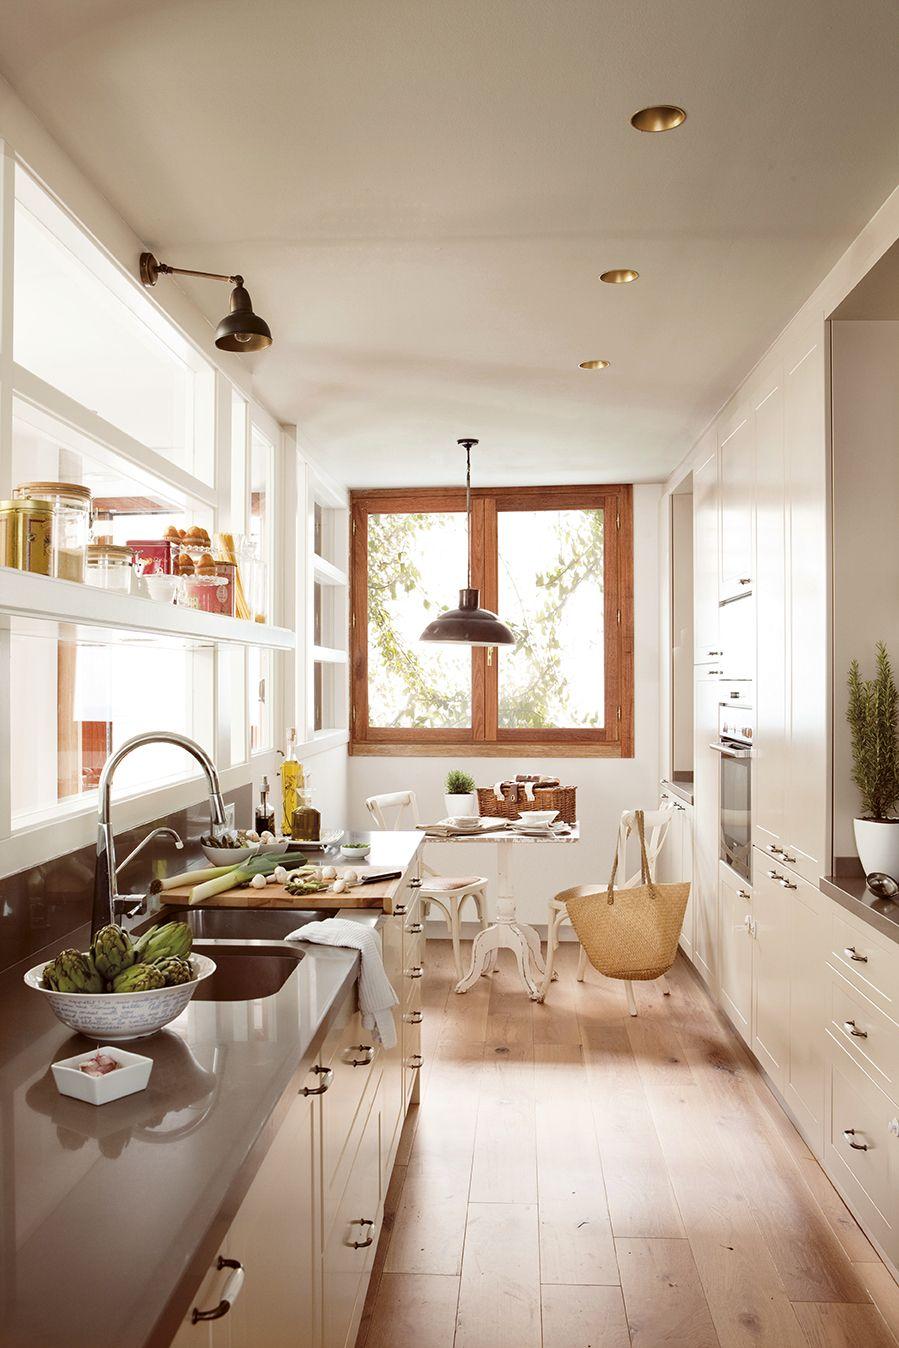 Un Pequeno Office Decoracion De Cocina Decoracion De Cocina Moderna Decoracion De Cocinas Rusticas